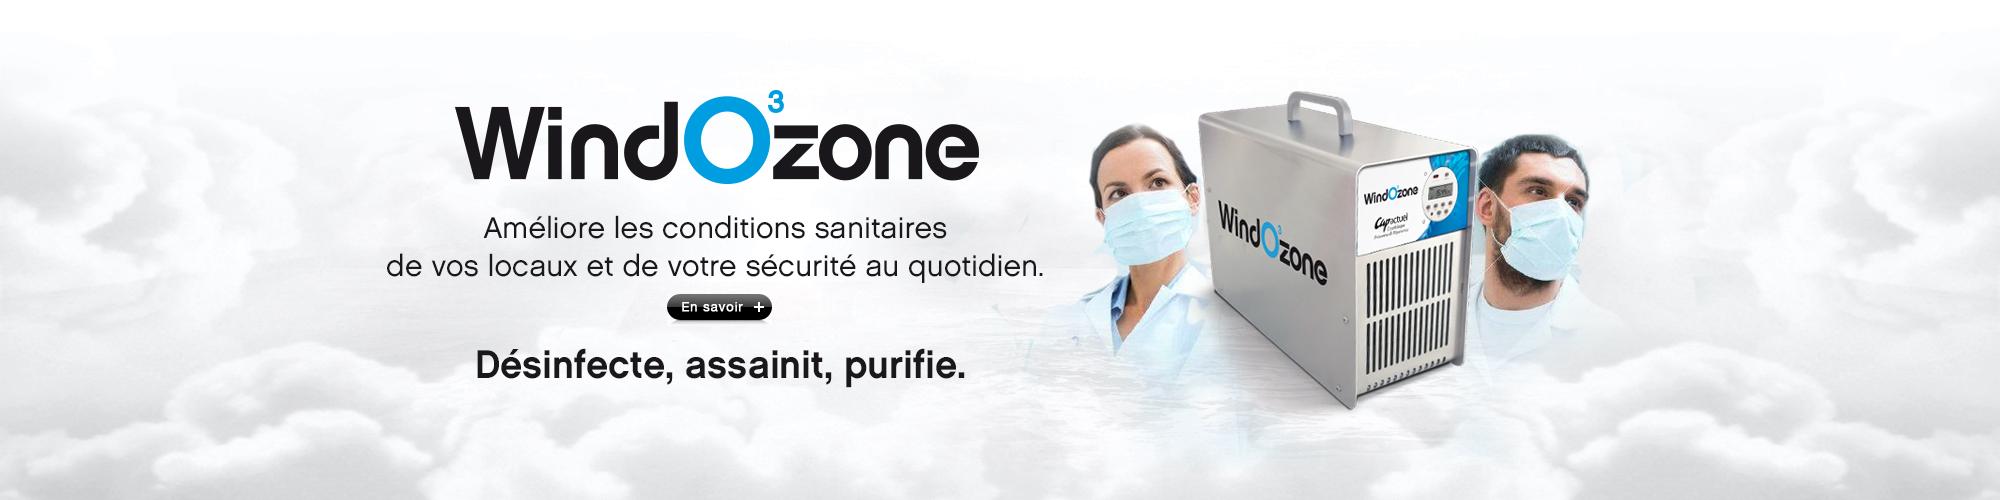 https://www.capactuel.com/storage/app/media/Accueil/ozone.jpg